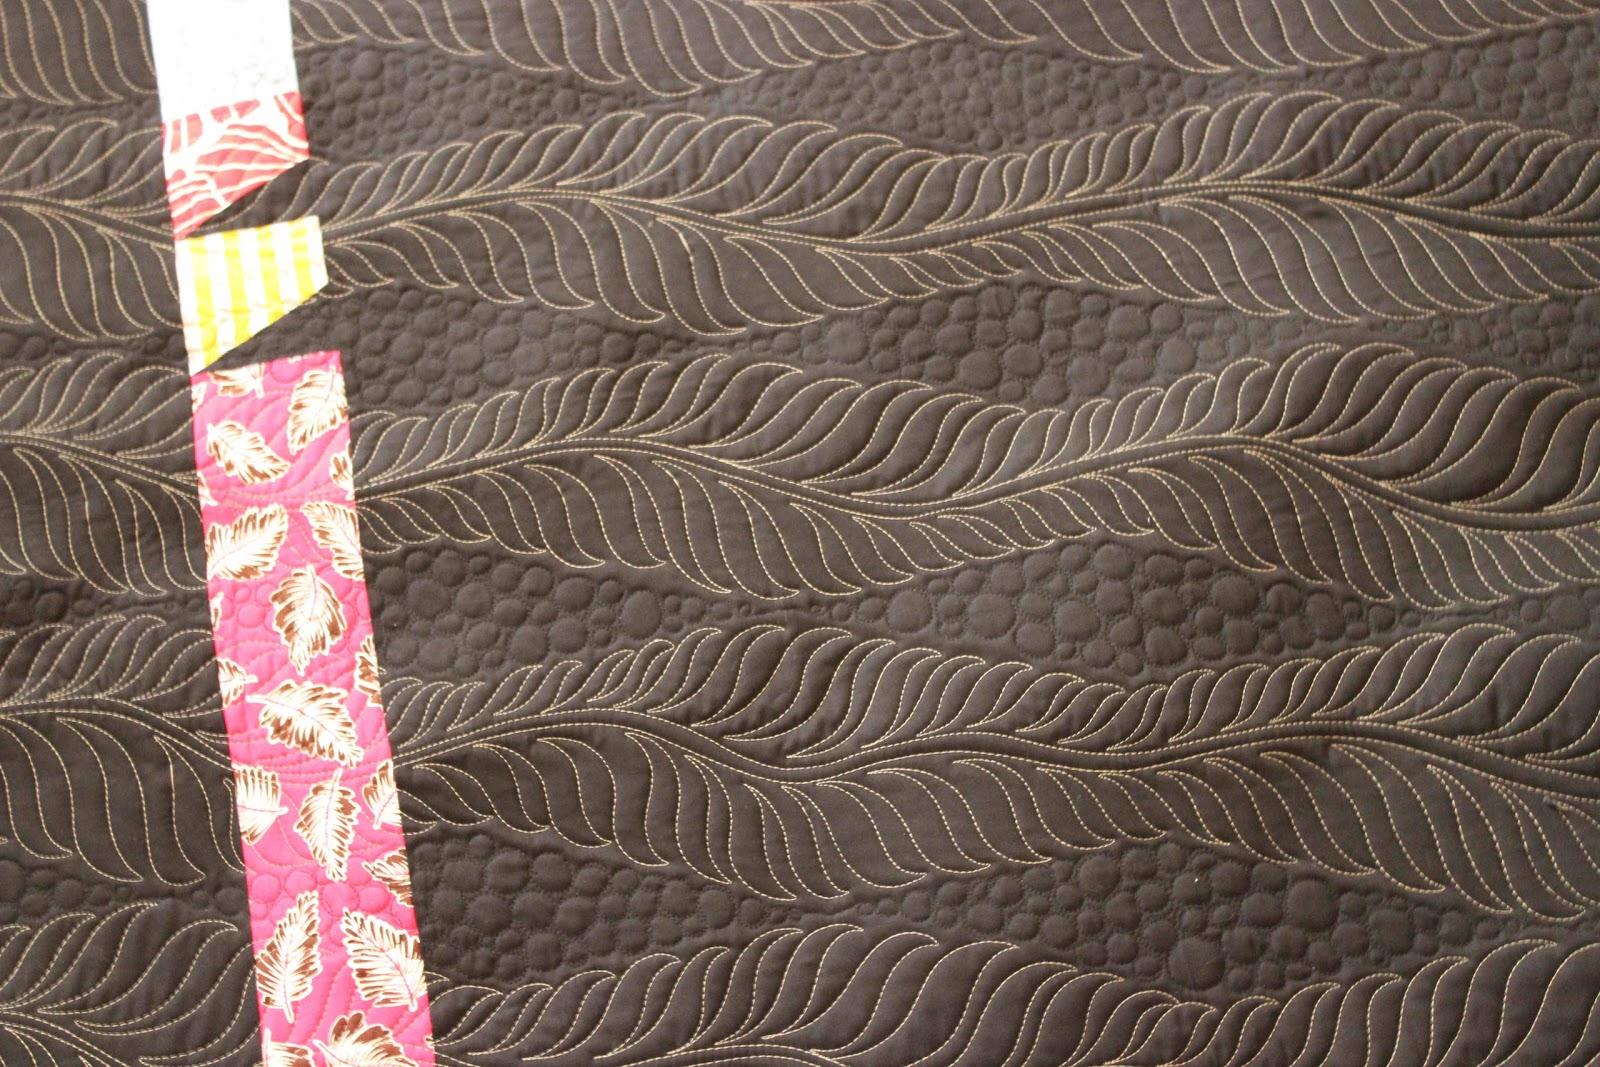 Bamboo Quilts | Bamboo Valance Photo : bamboo quilt - Adamdwight.com